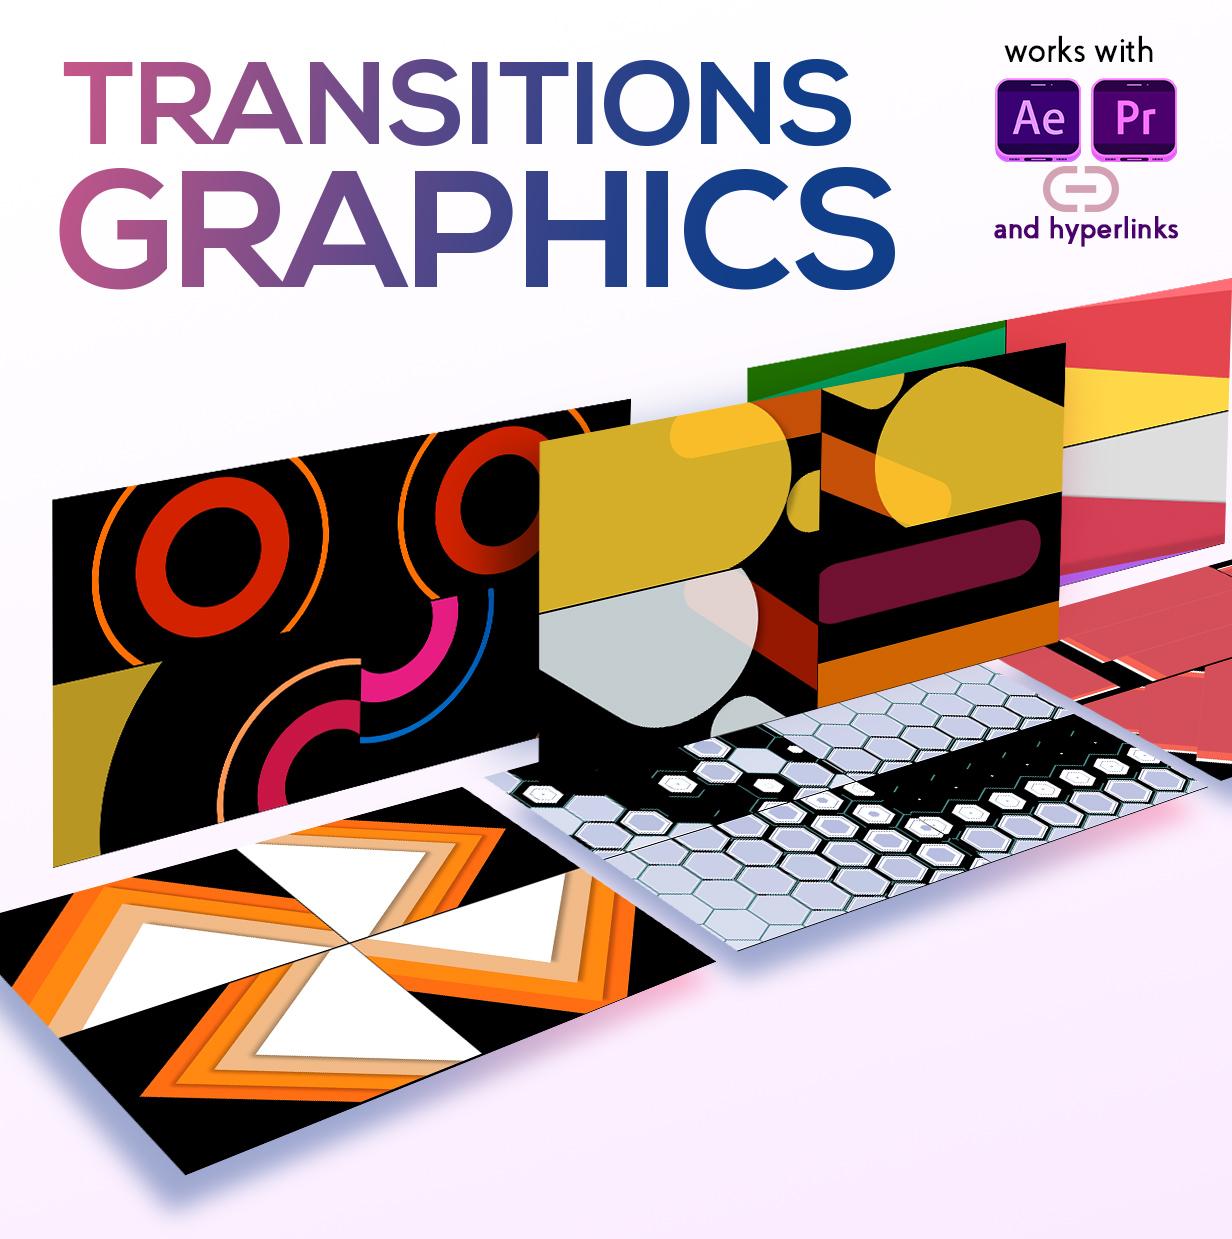 The Graphics - 7